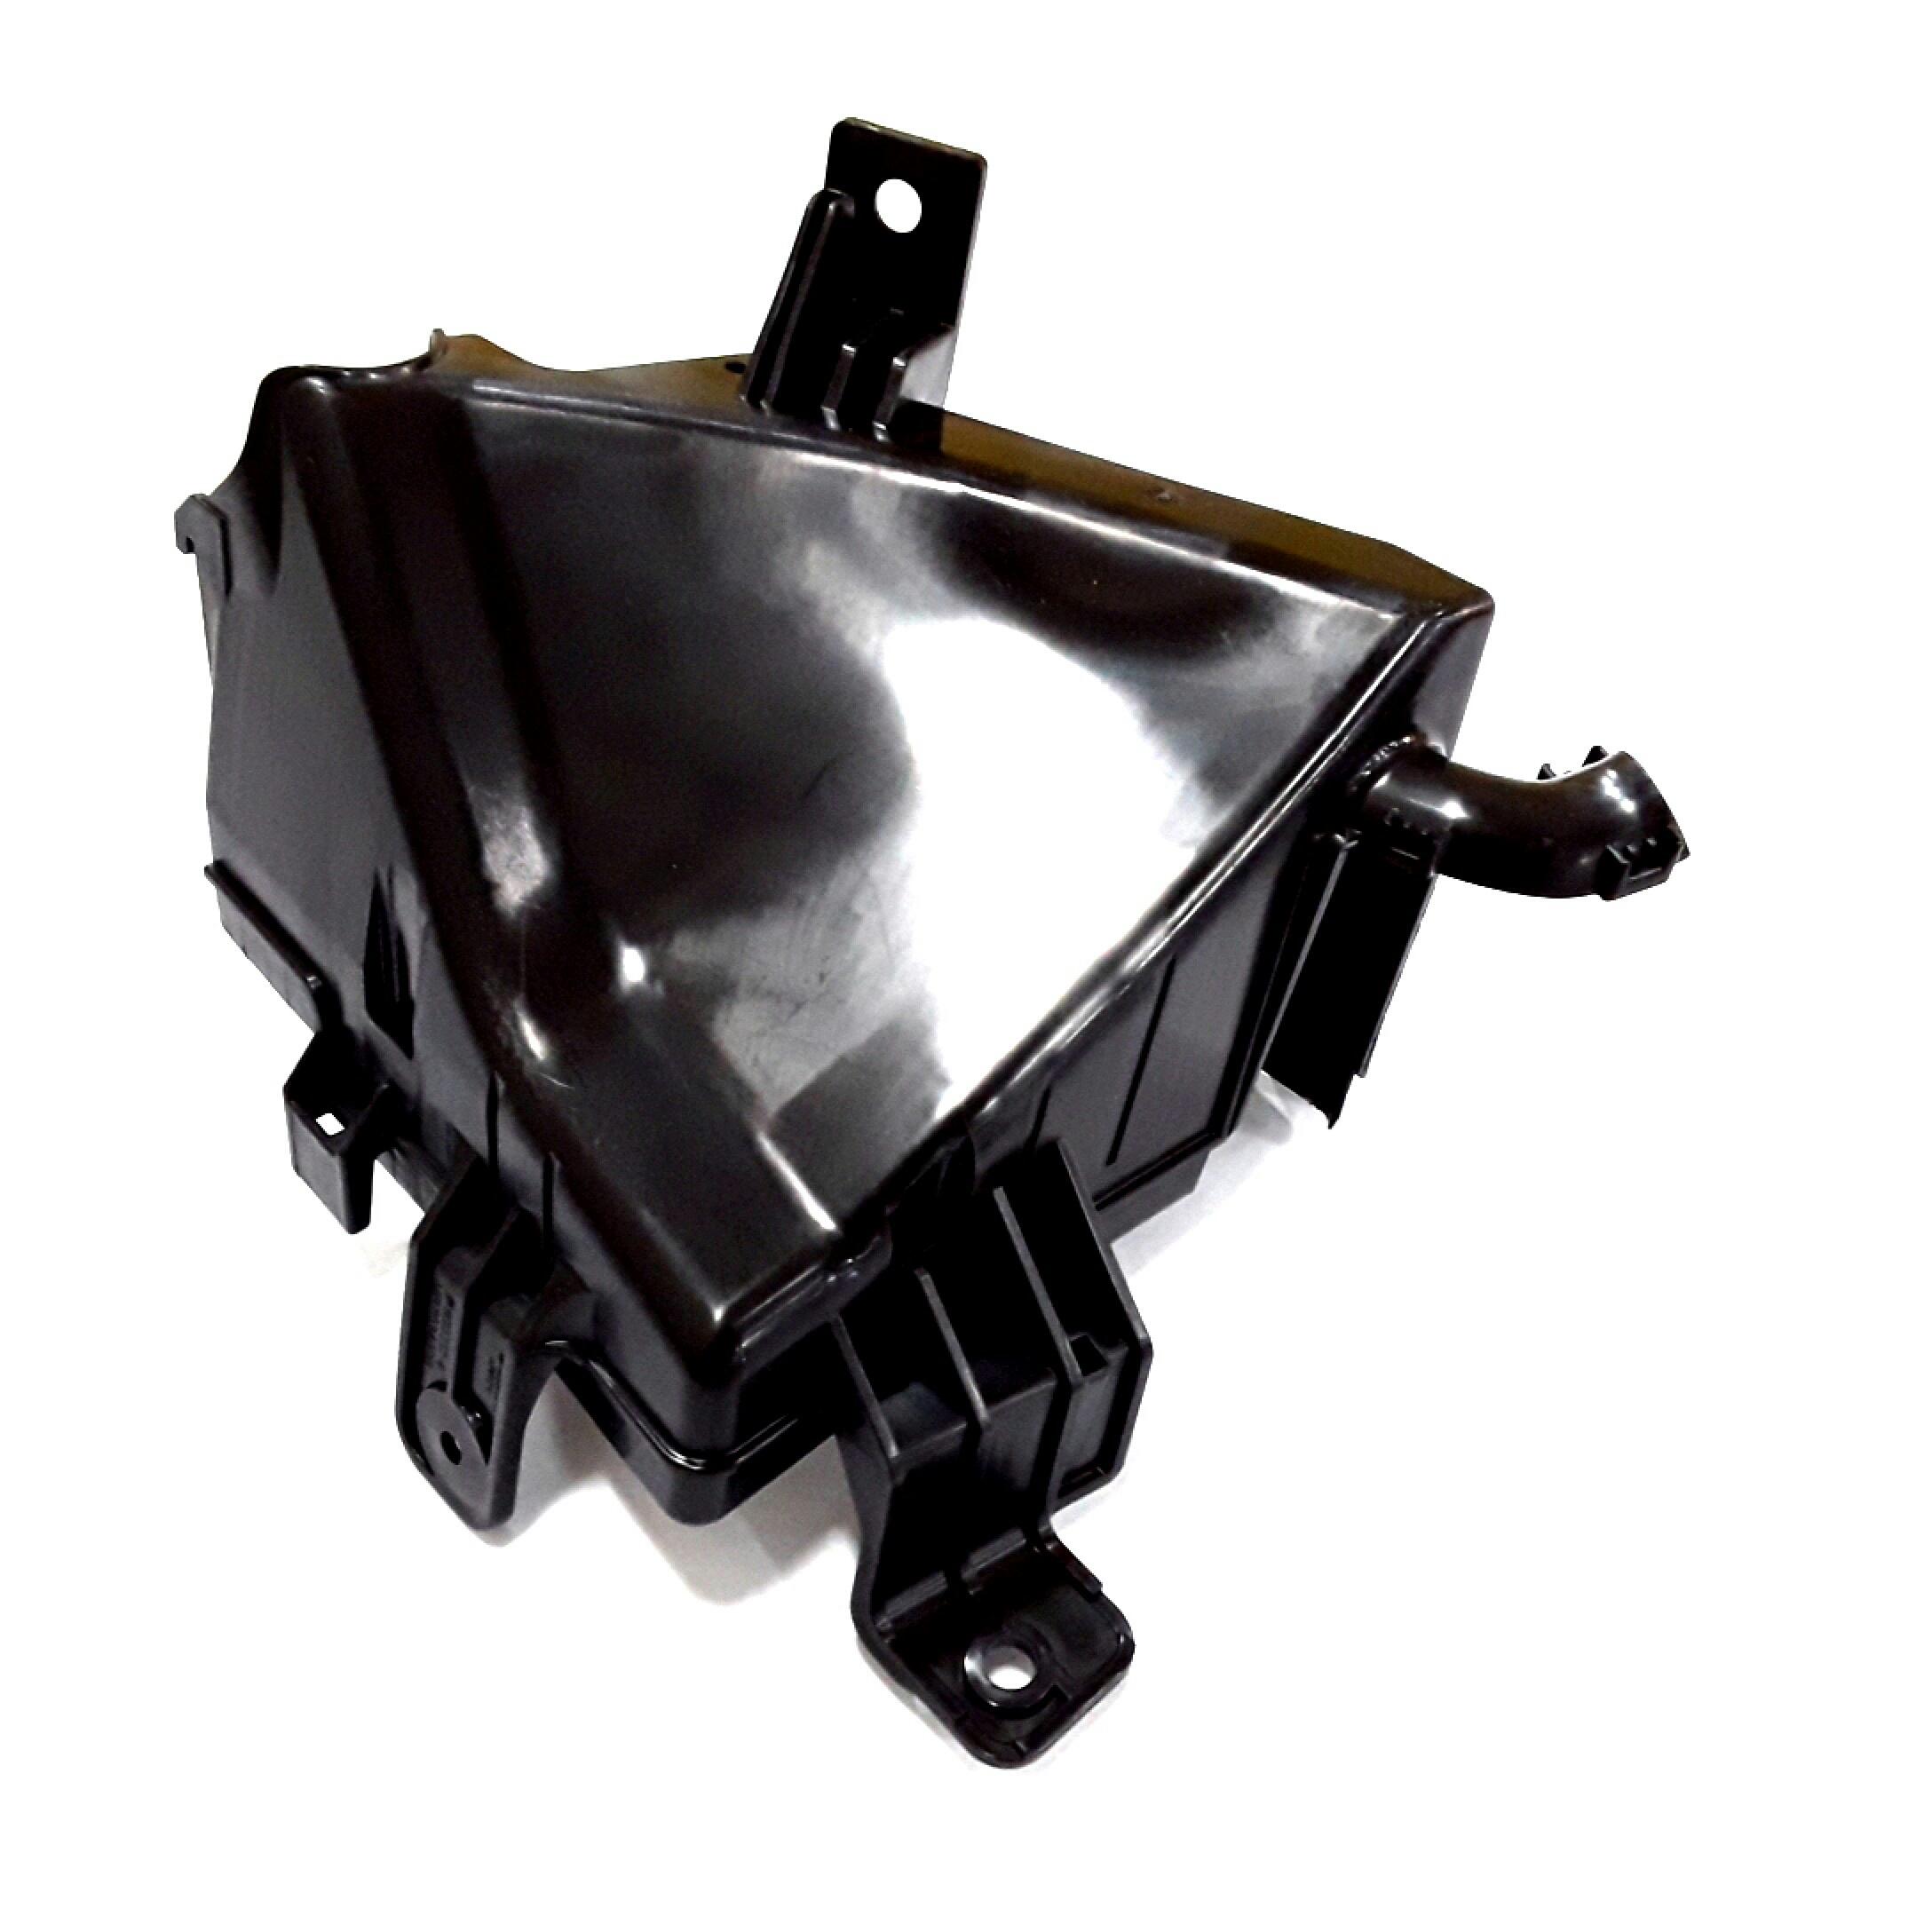 subaru impreza cover fuse box under wiring main harness. Black Bedroom Furniture Sets. Home Design Ideas